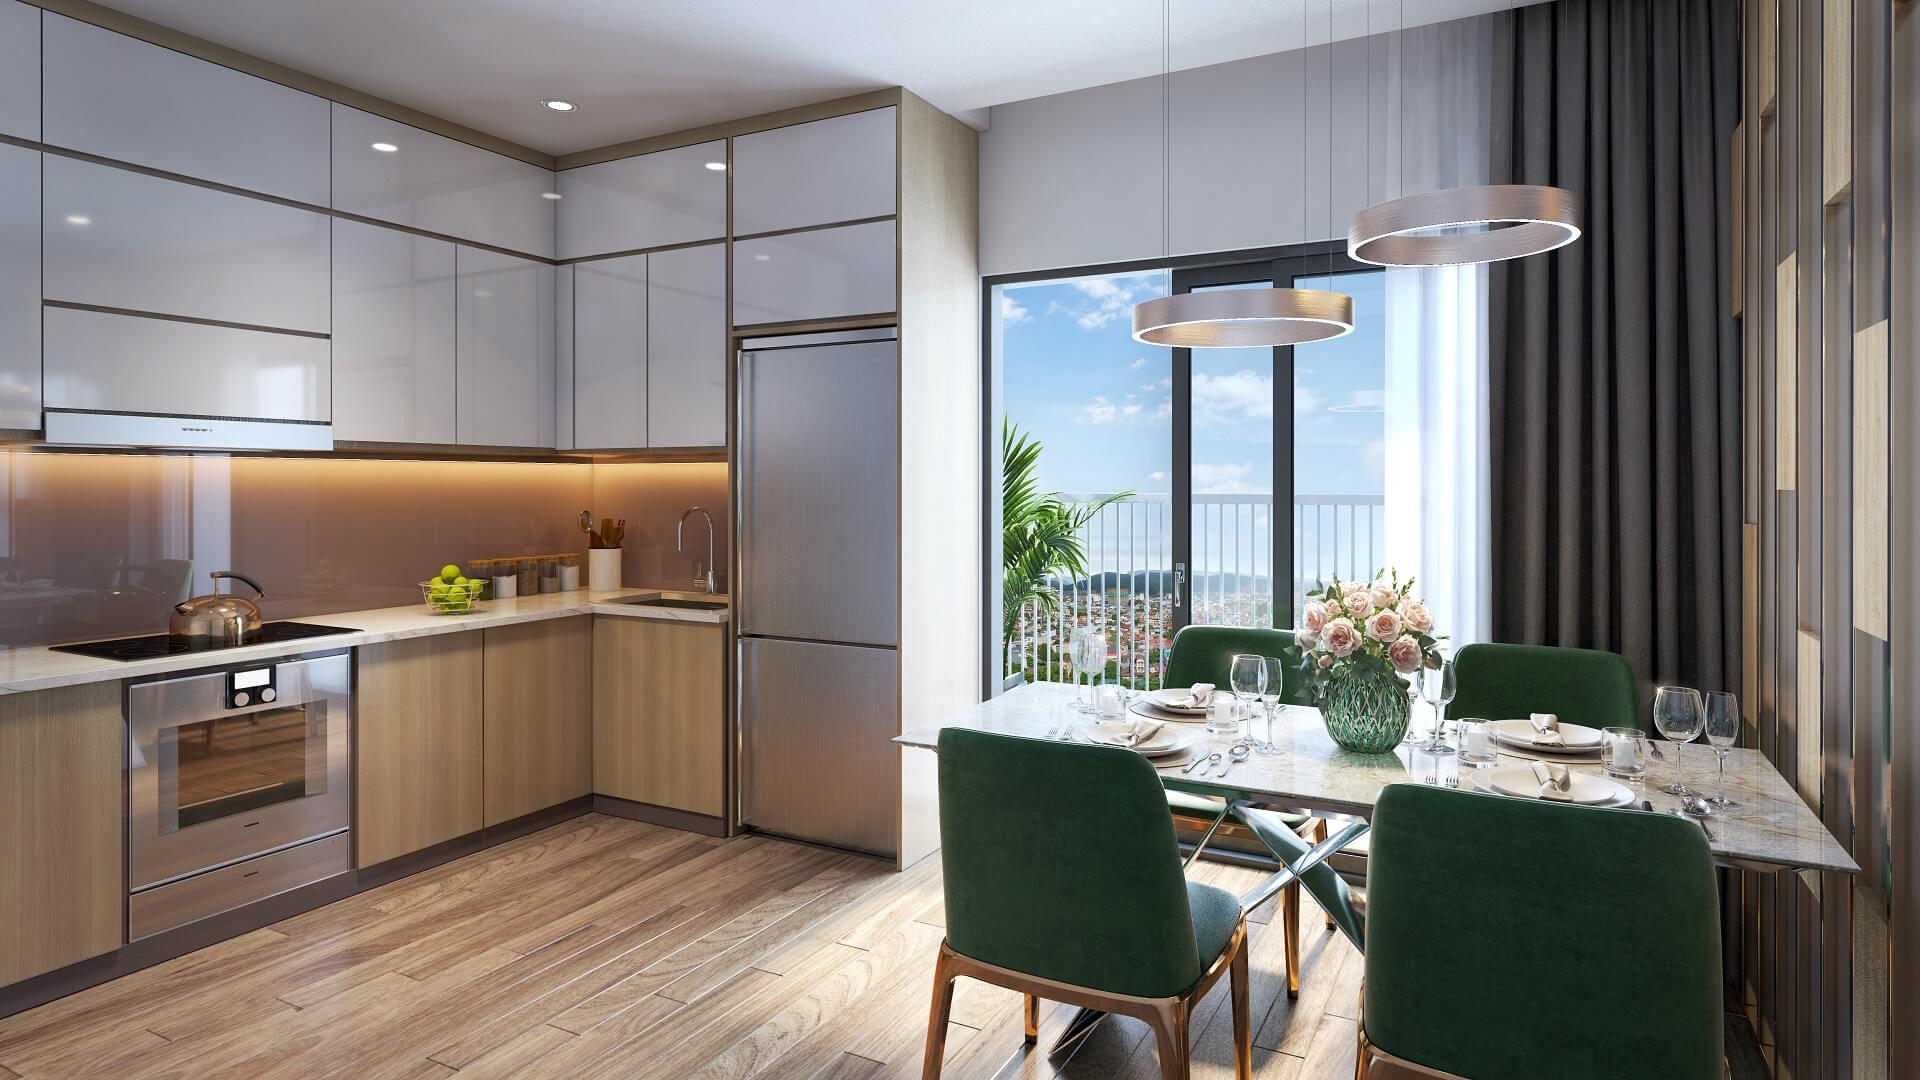 nội thất phòng bếp tecco elite city